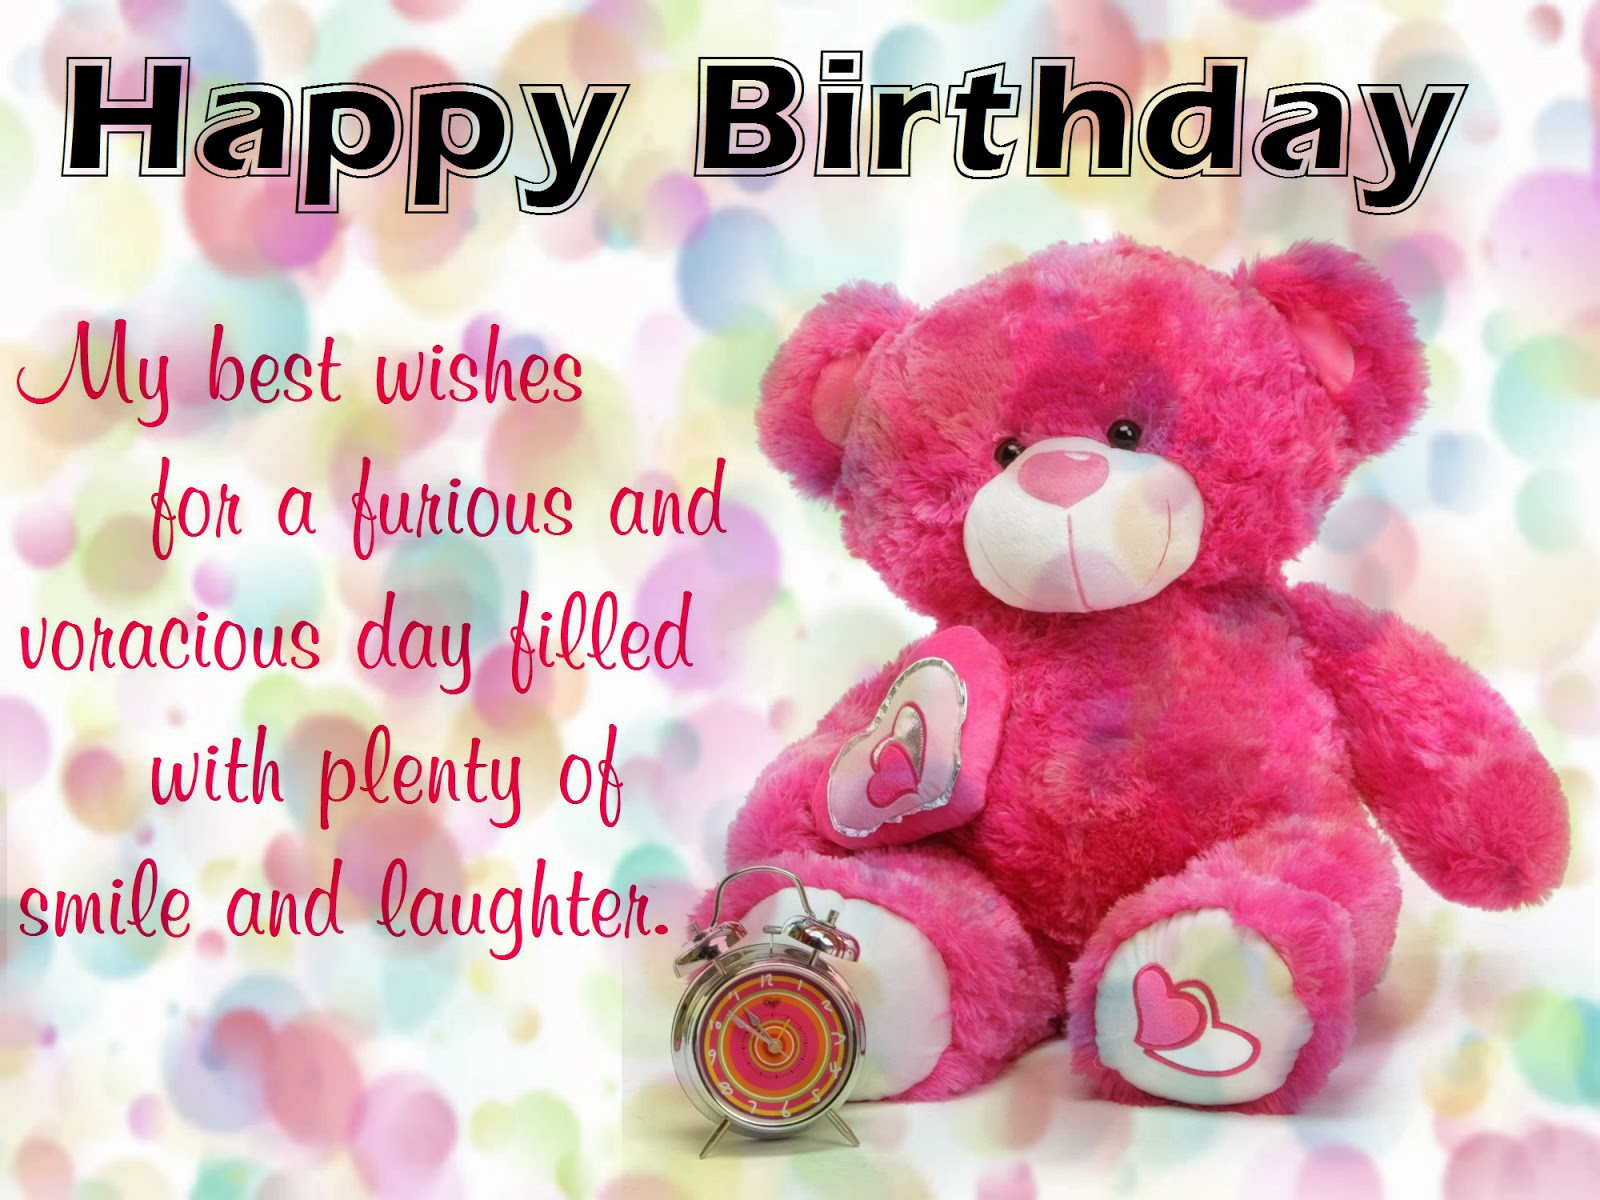 Best Friend Birthday Wishes For Facebook Teddy bear birthday photos,